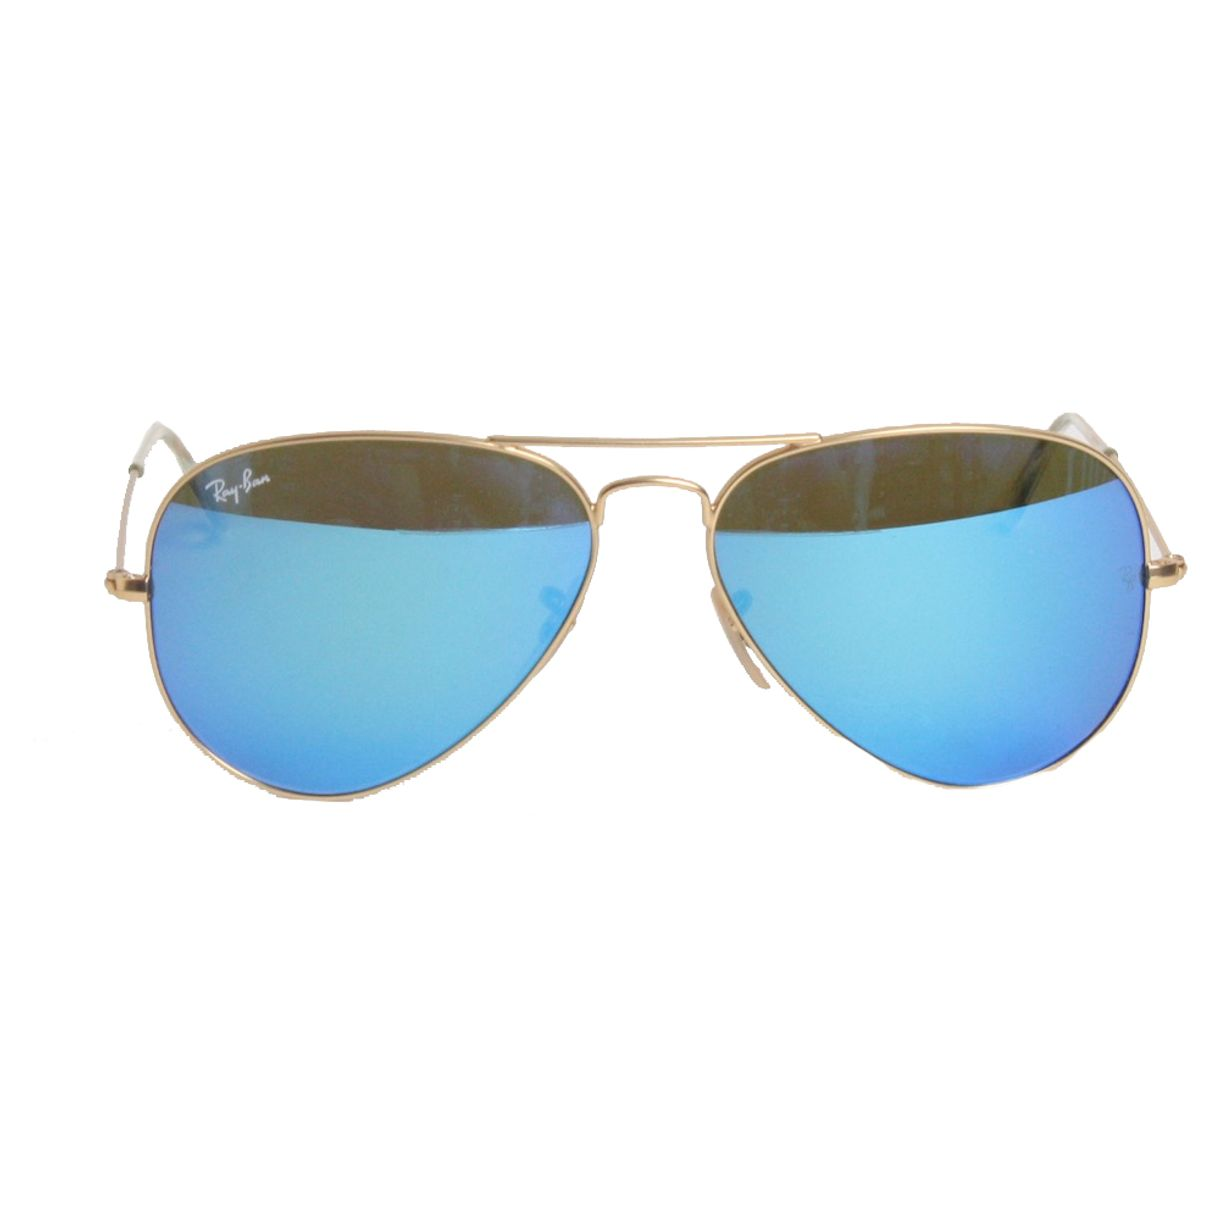 Oculos-Ray-Ban-Aviator-Espelhado-Azul